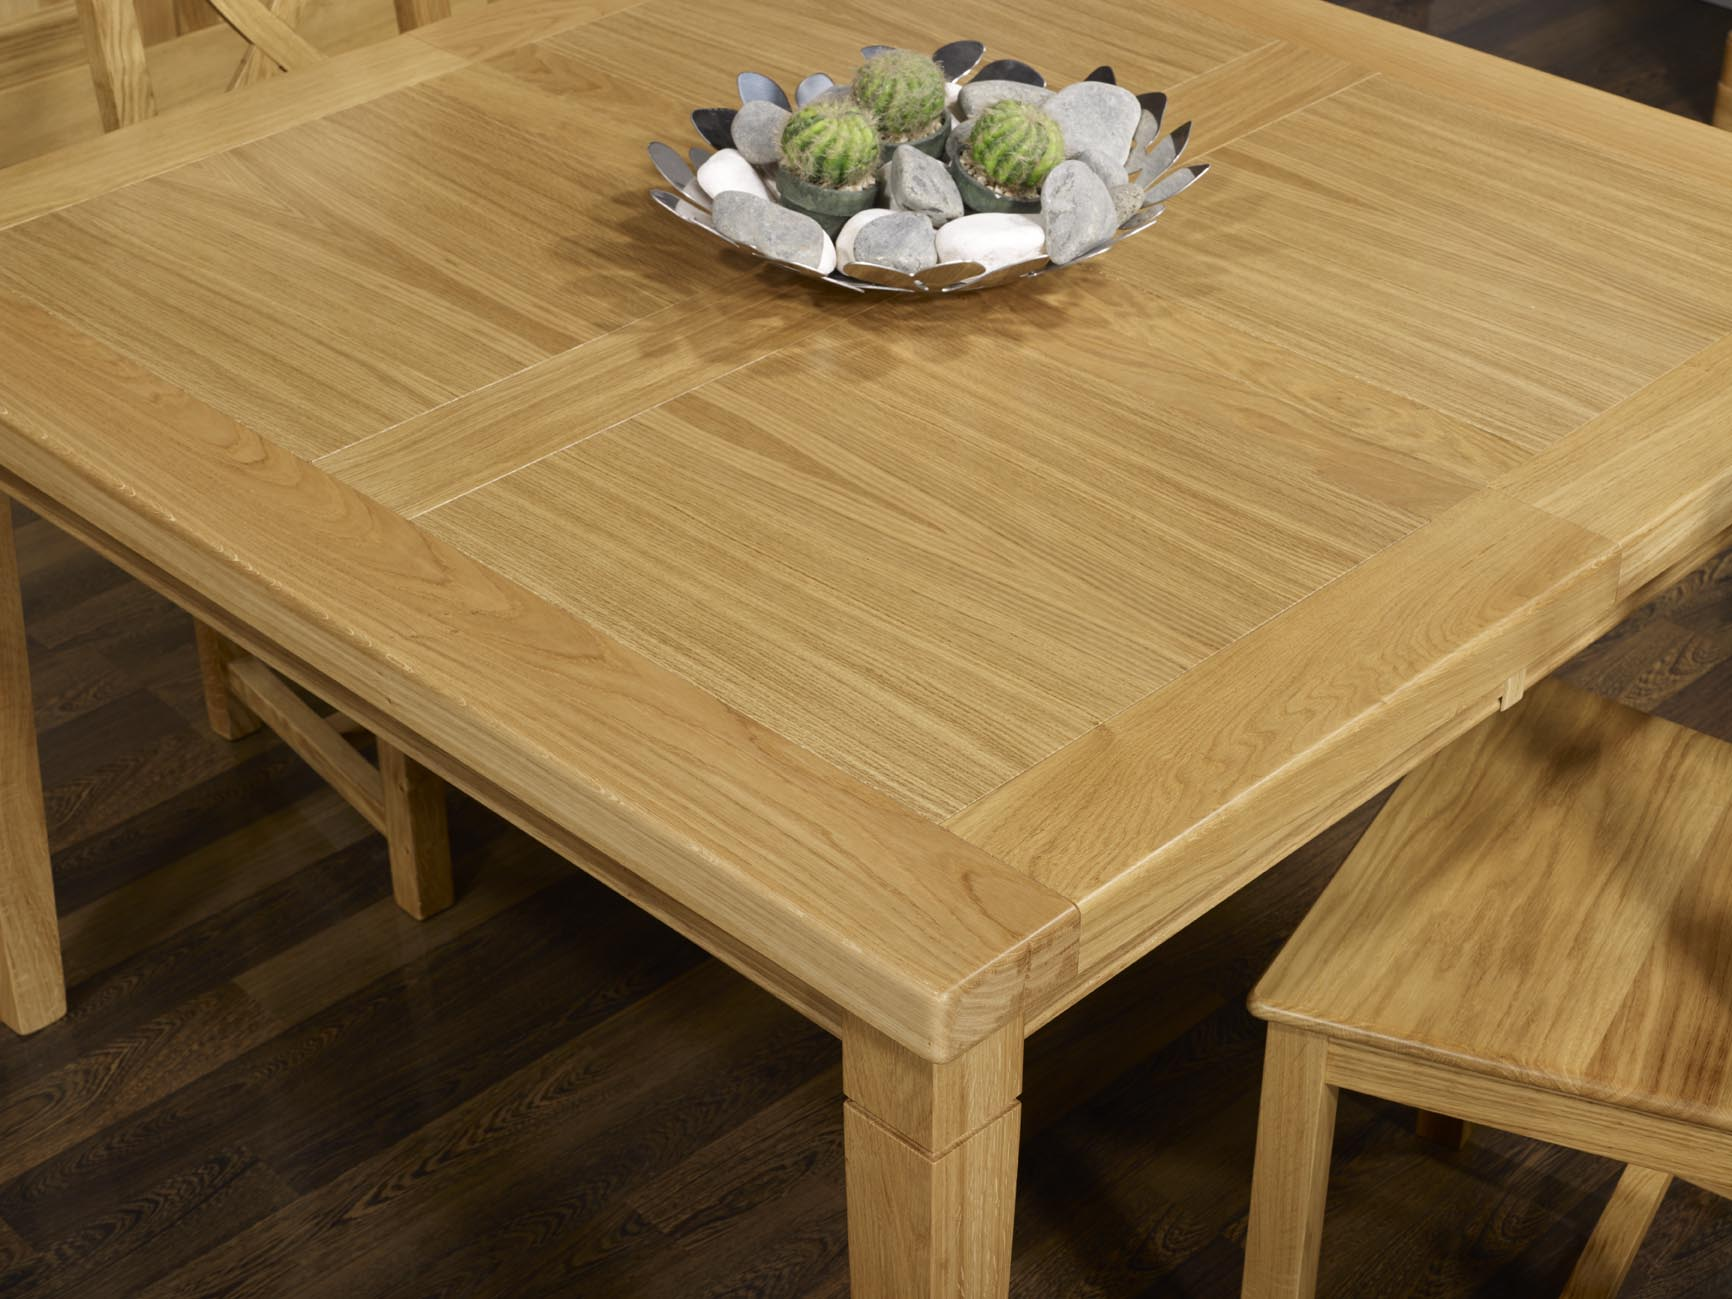 Table de repas carr e en ch ne massif 150x150 meuble en for Table carree en chene